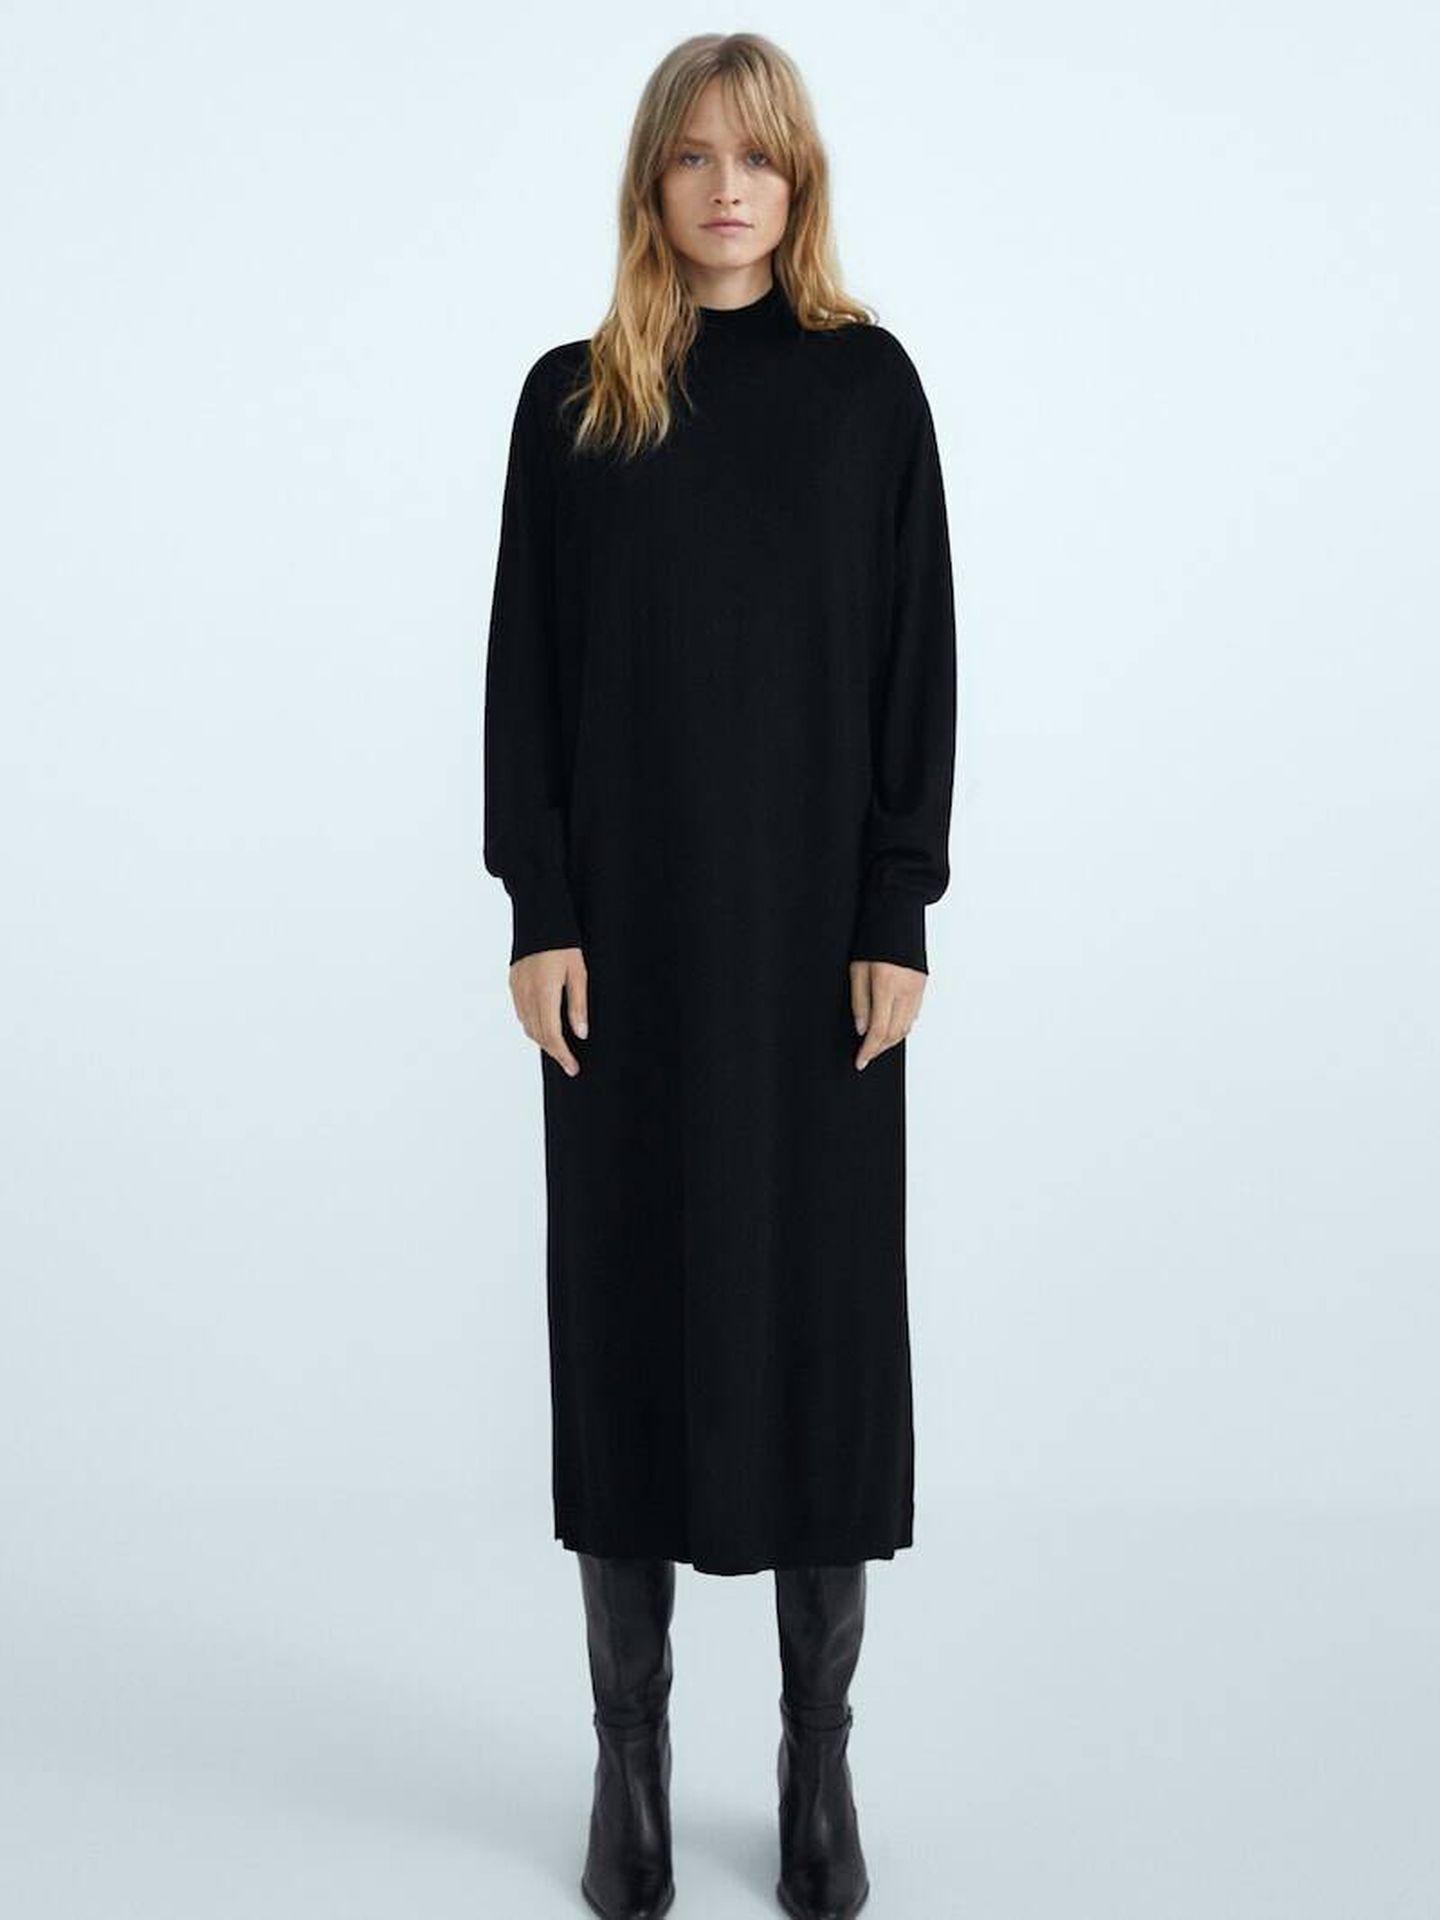 Vestido negro de Massimo Dutti. (Cortesía)